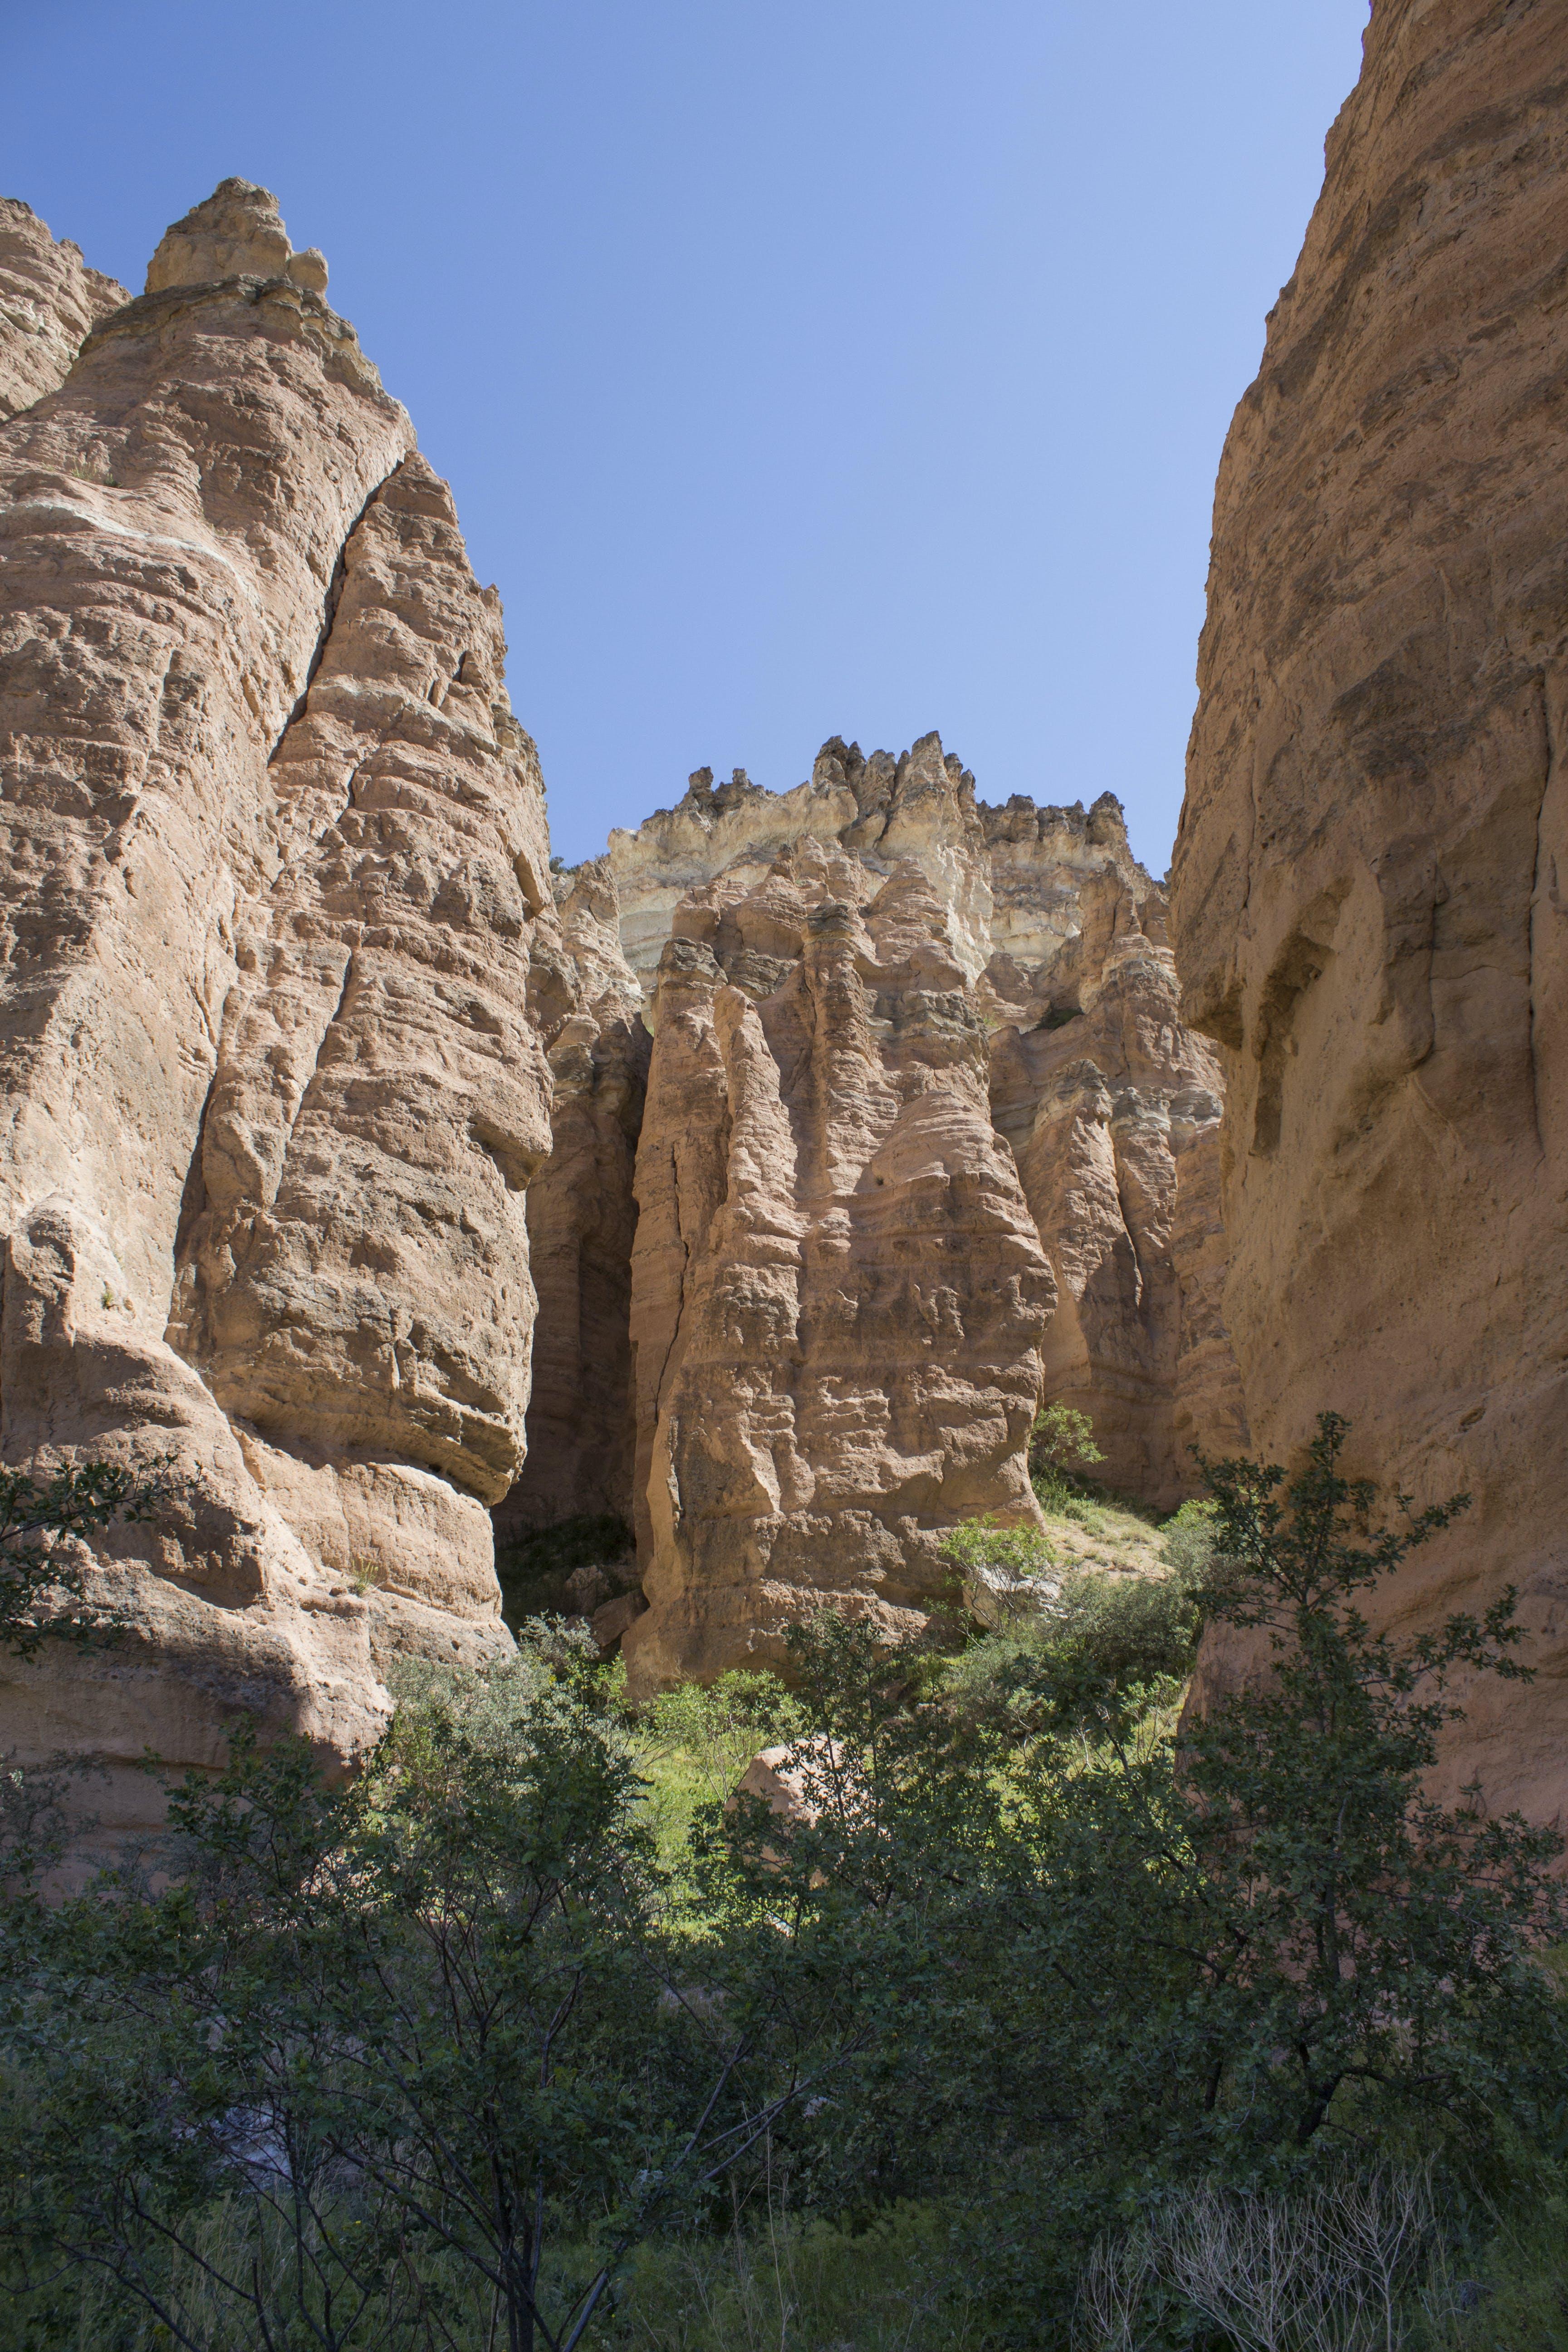 Free stock photo of nature, rocks, cappadocia, canyon